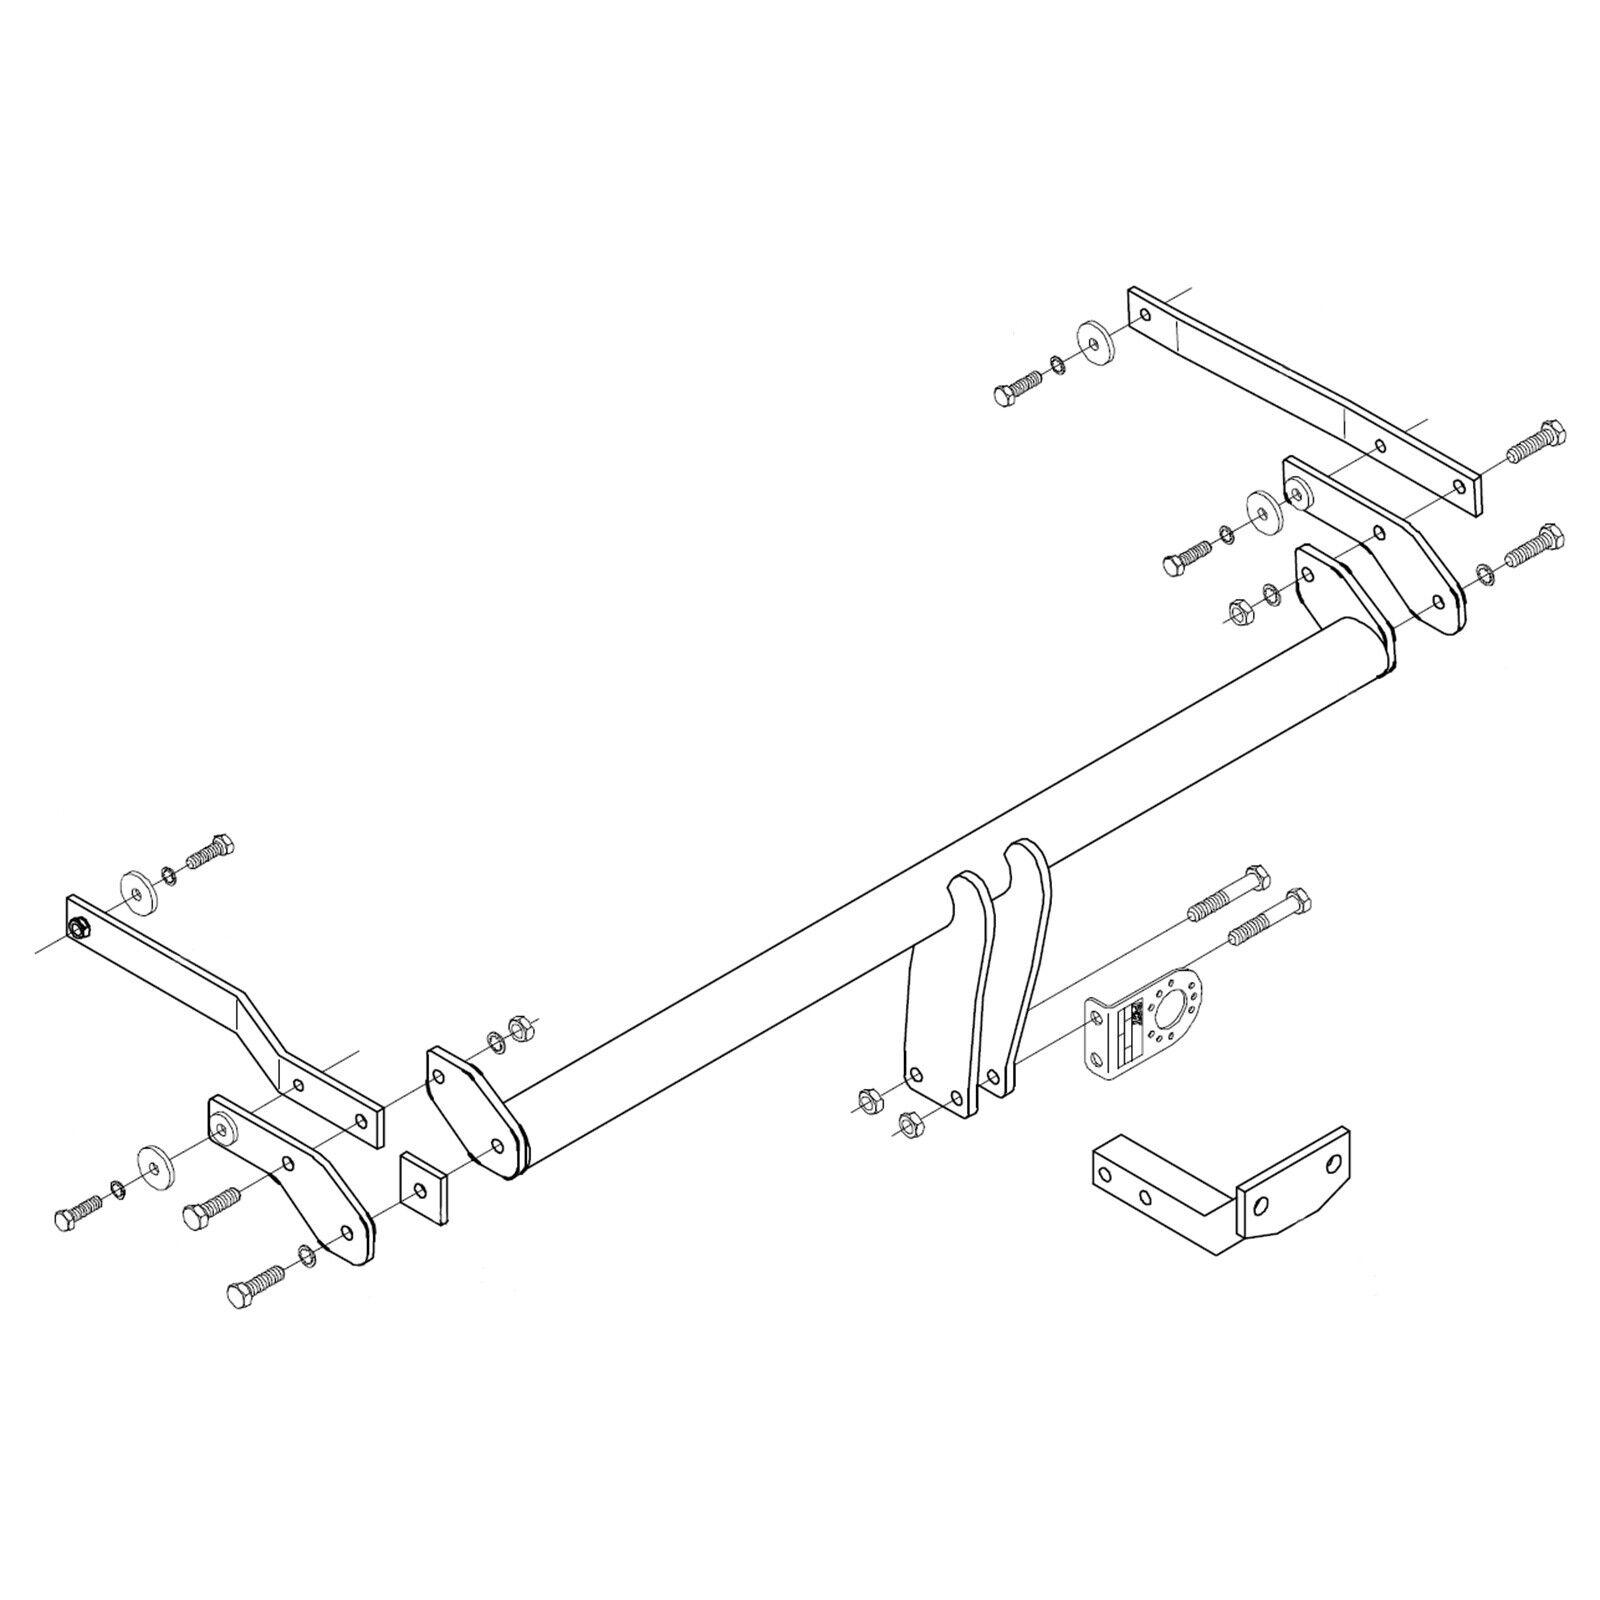 hight resolution of details about towbar for renault megane iii 5 door hatchback 2008 2016 flange tow bar